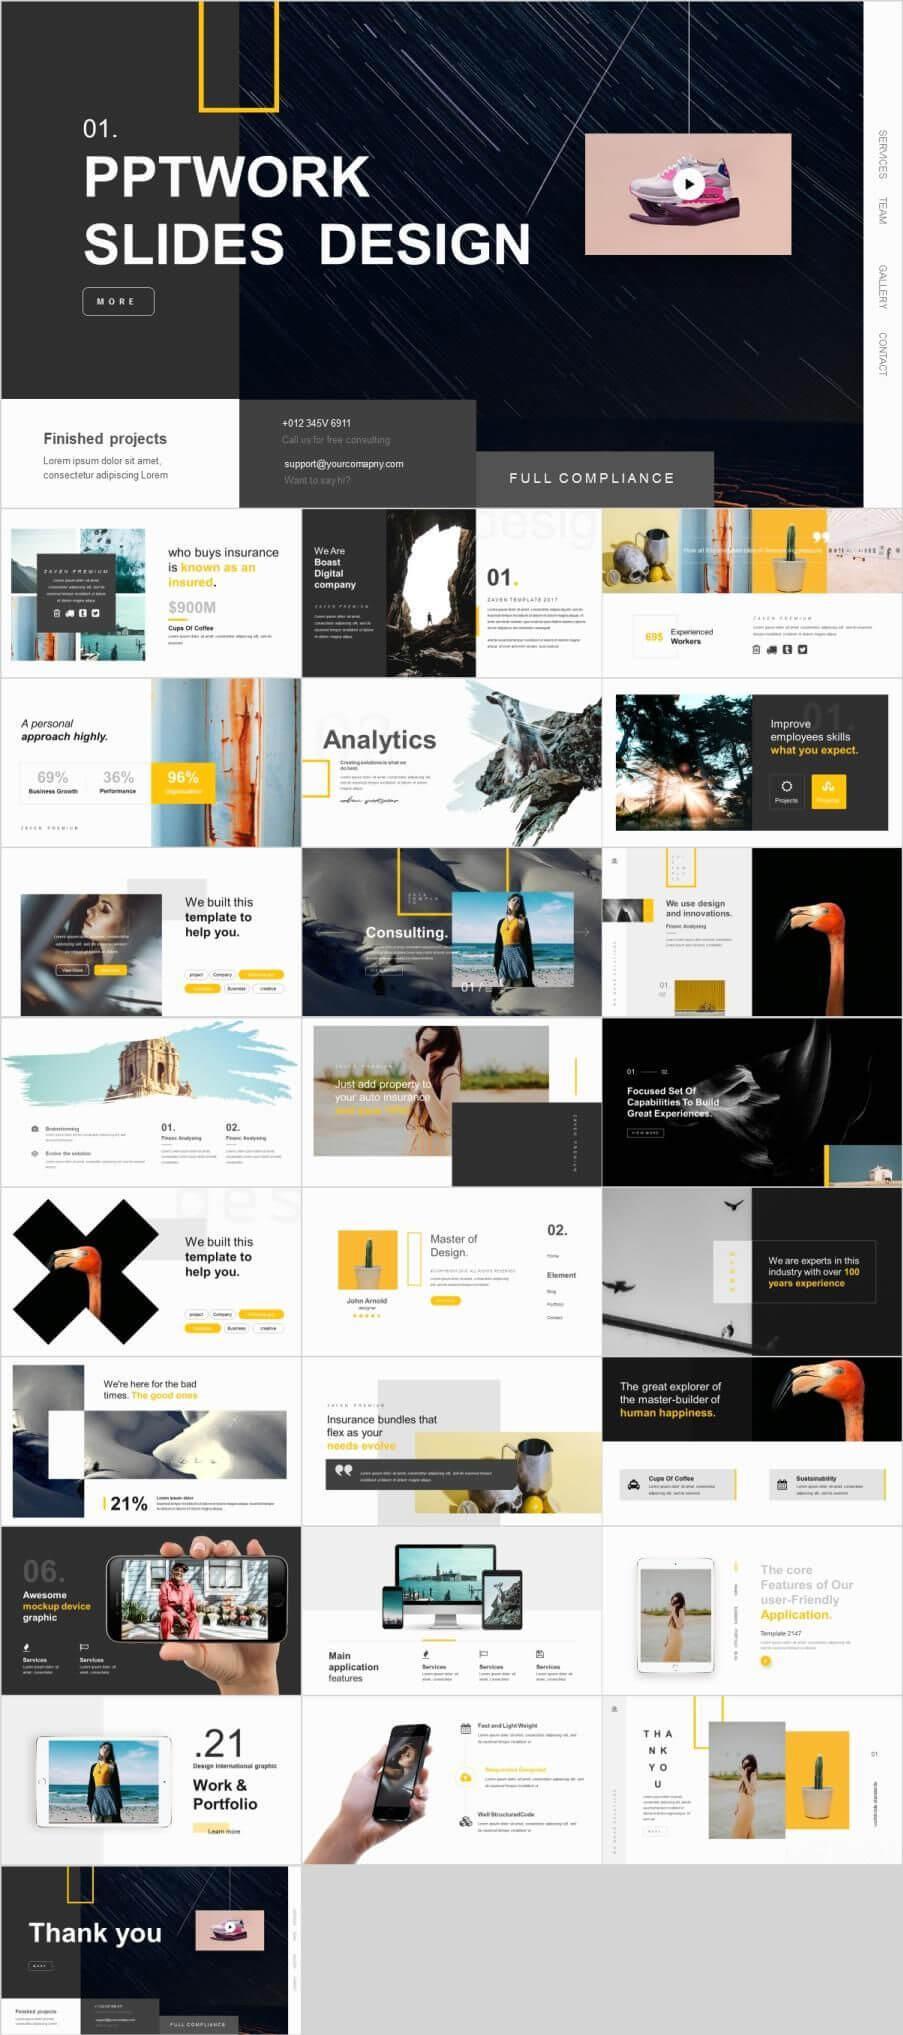 26+ Marketing Analysis Design Powerpoint Template | Business Pertaining To Powerpoint Photo Slideshow Template